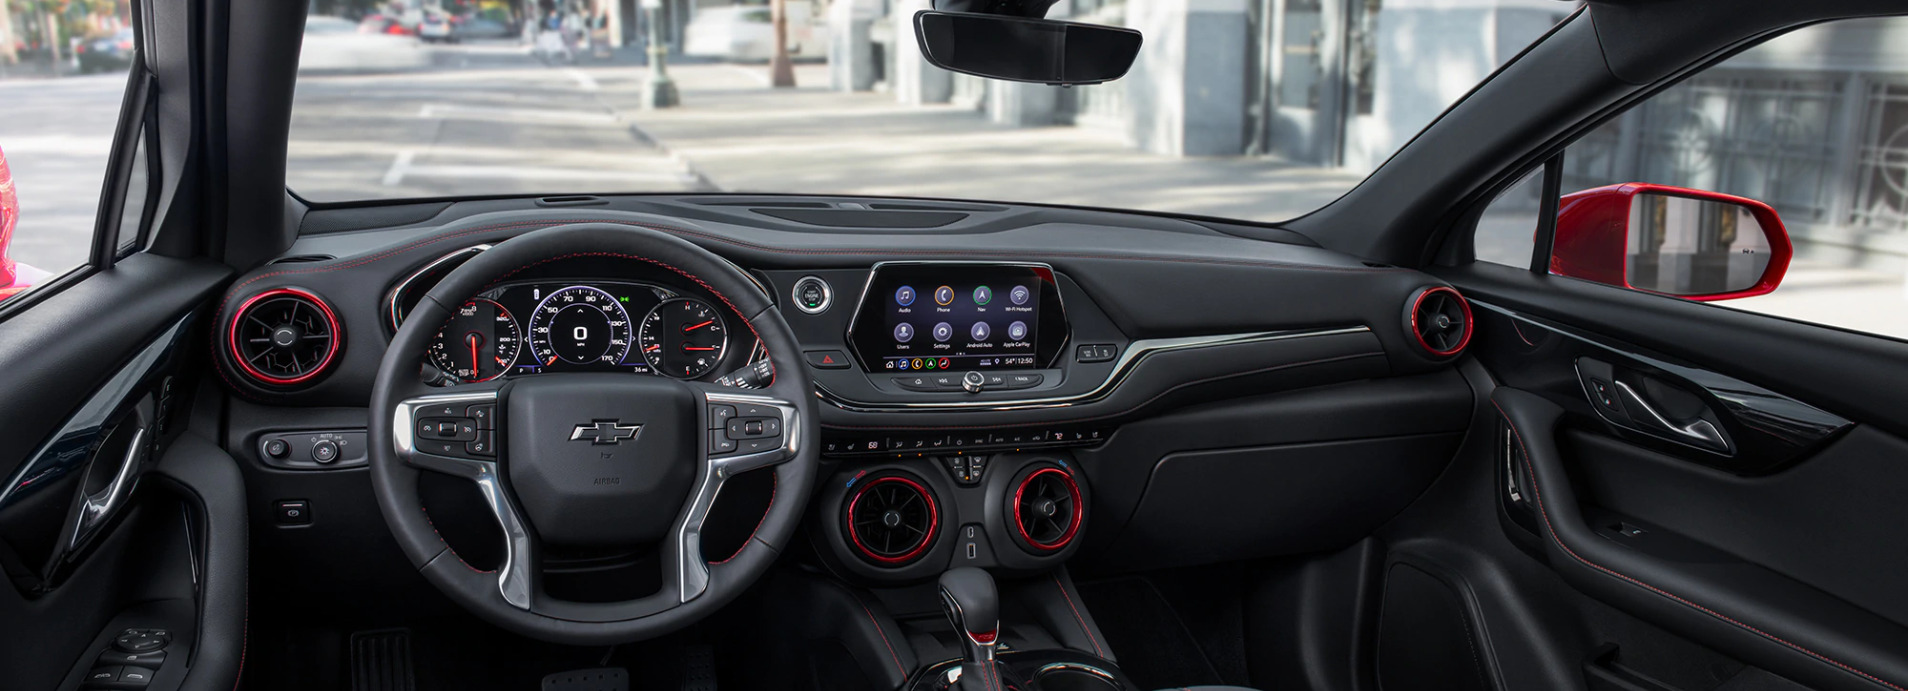 2020 Chevrolet Blazer Overview The News Wheel